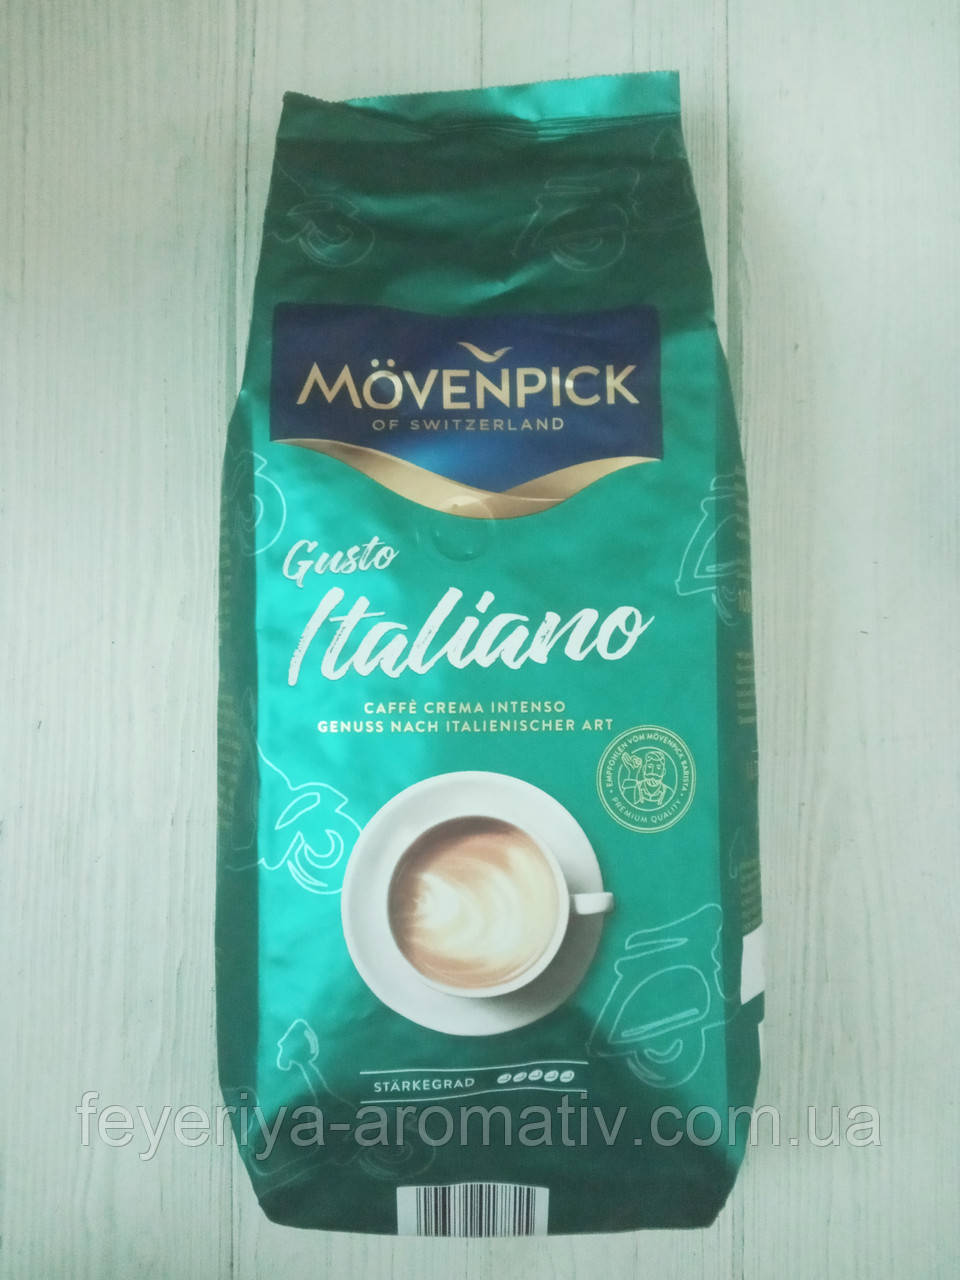 Кофе в зернах Movenpick Caffe Crema Gusto Italiano Intenso 1кг. (Германия)